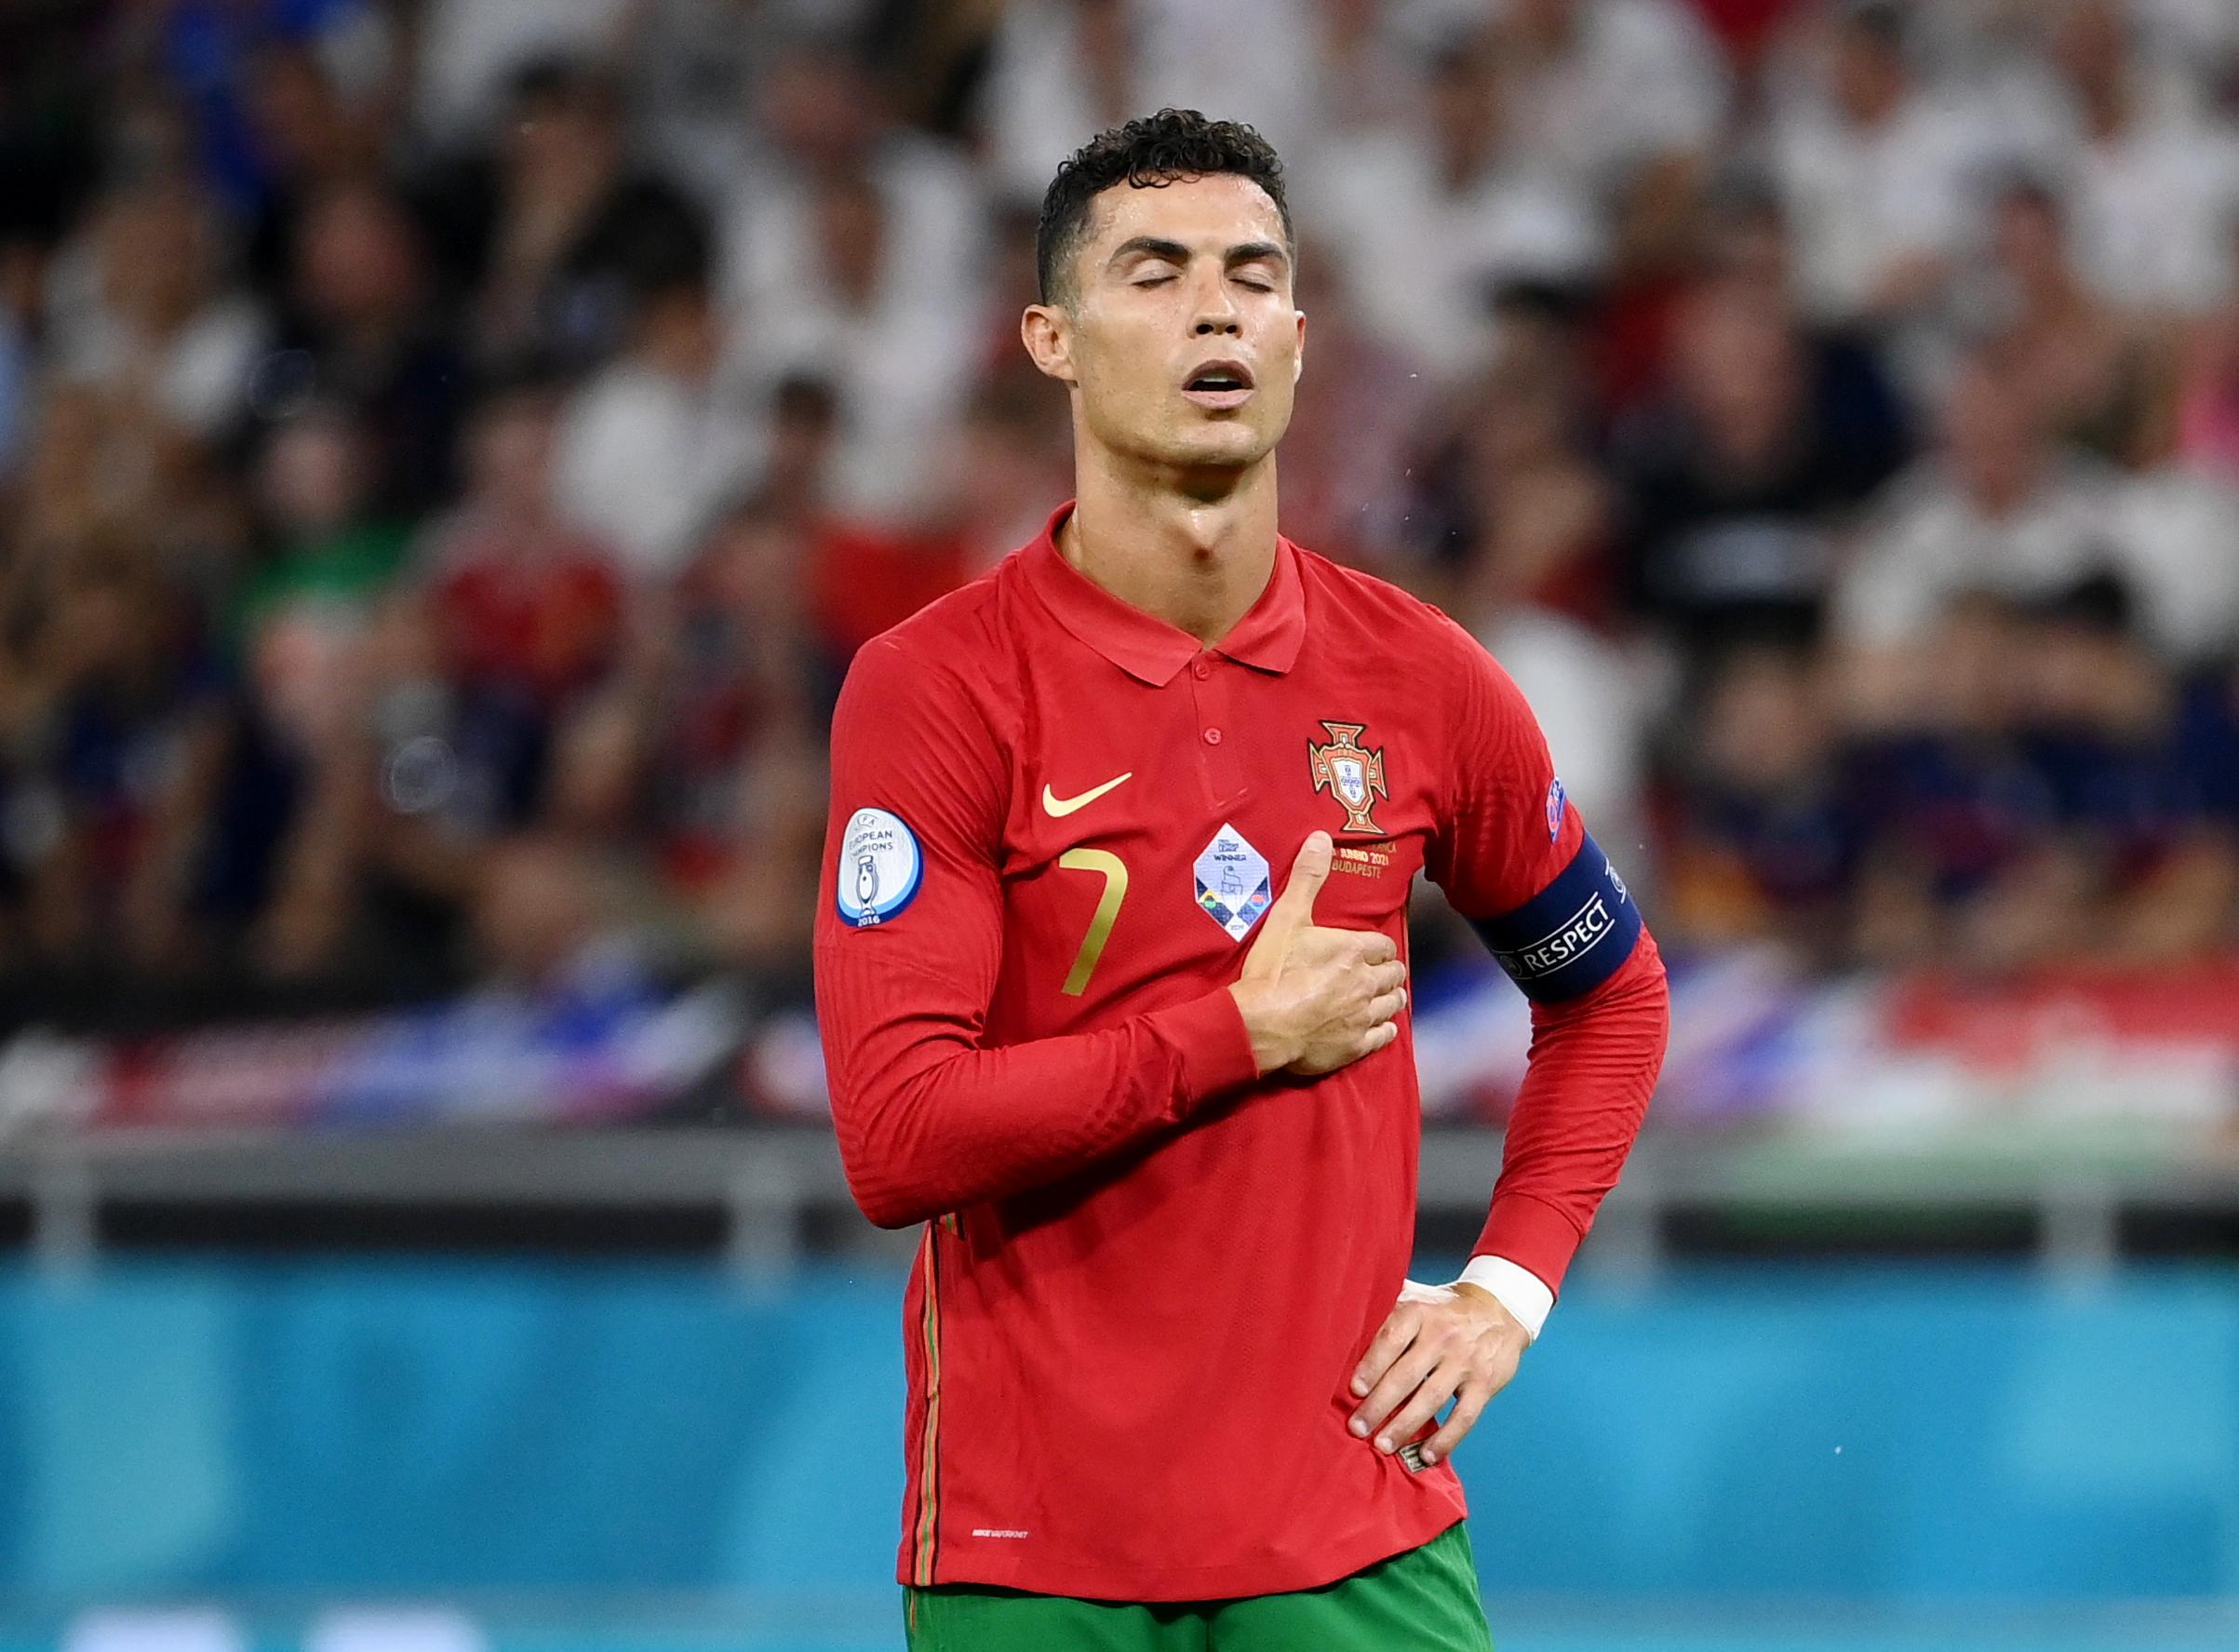 Euro 2020, Πορτογαλία – Γαλλία: Έγραψε ιστορία ο Ρονάλντο με δεύτερο πέναλτι